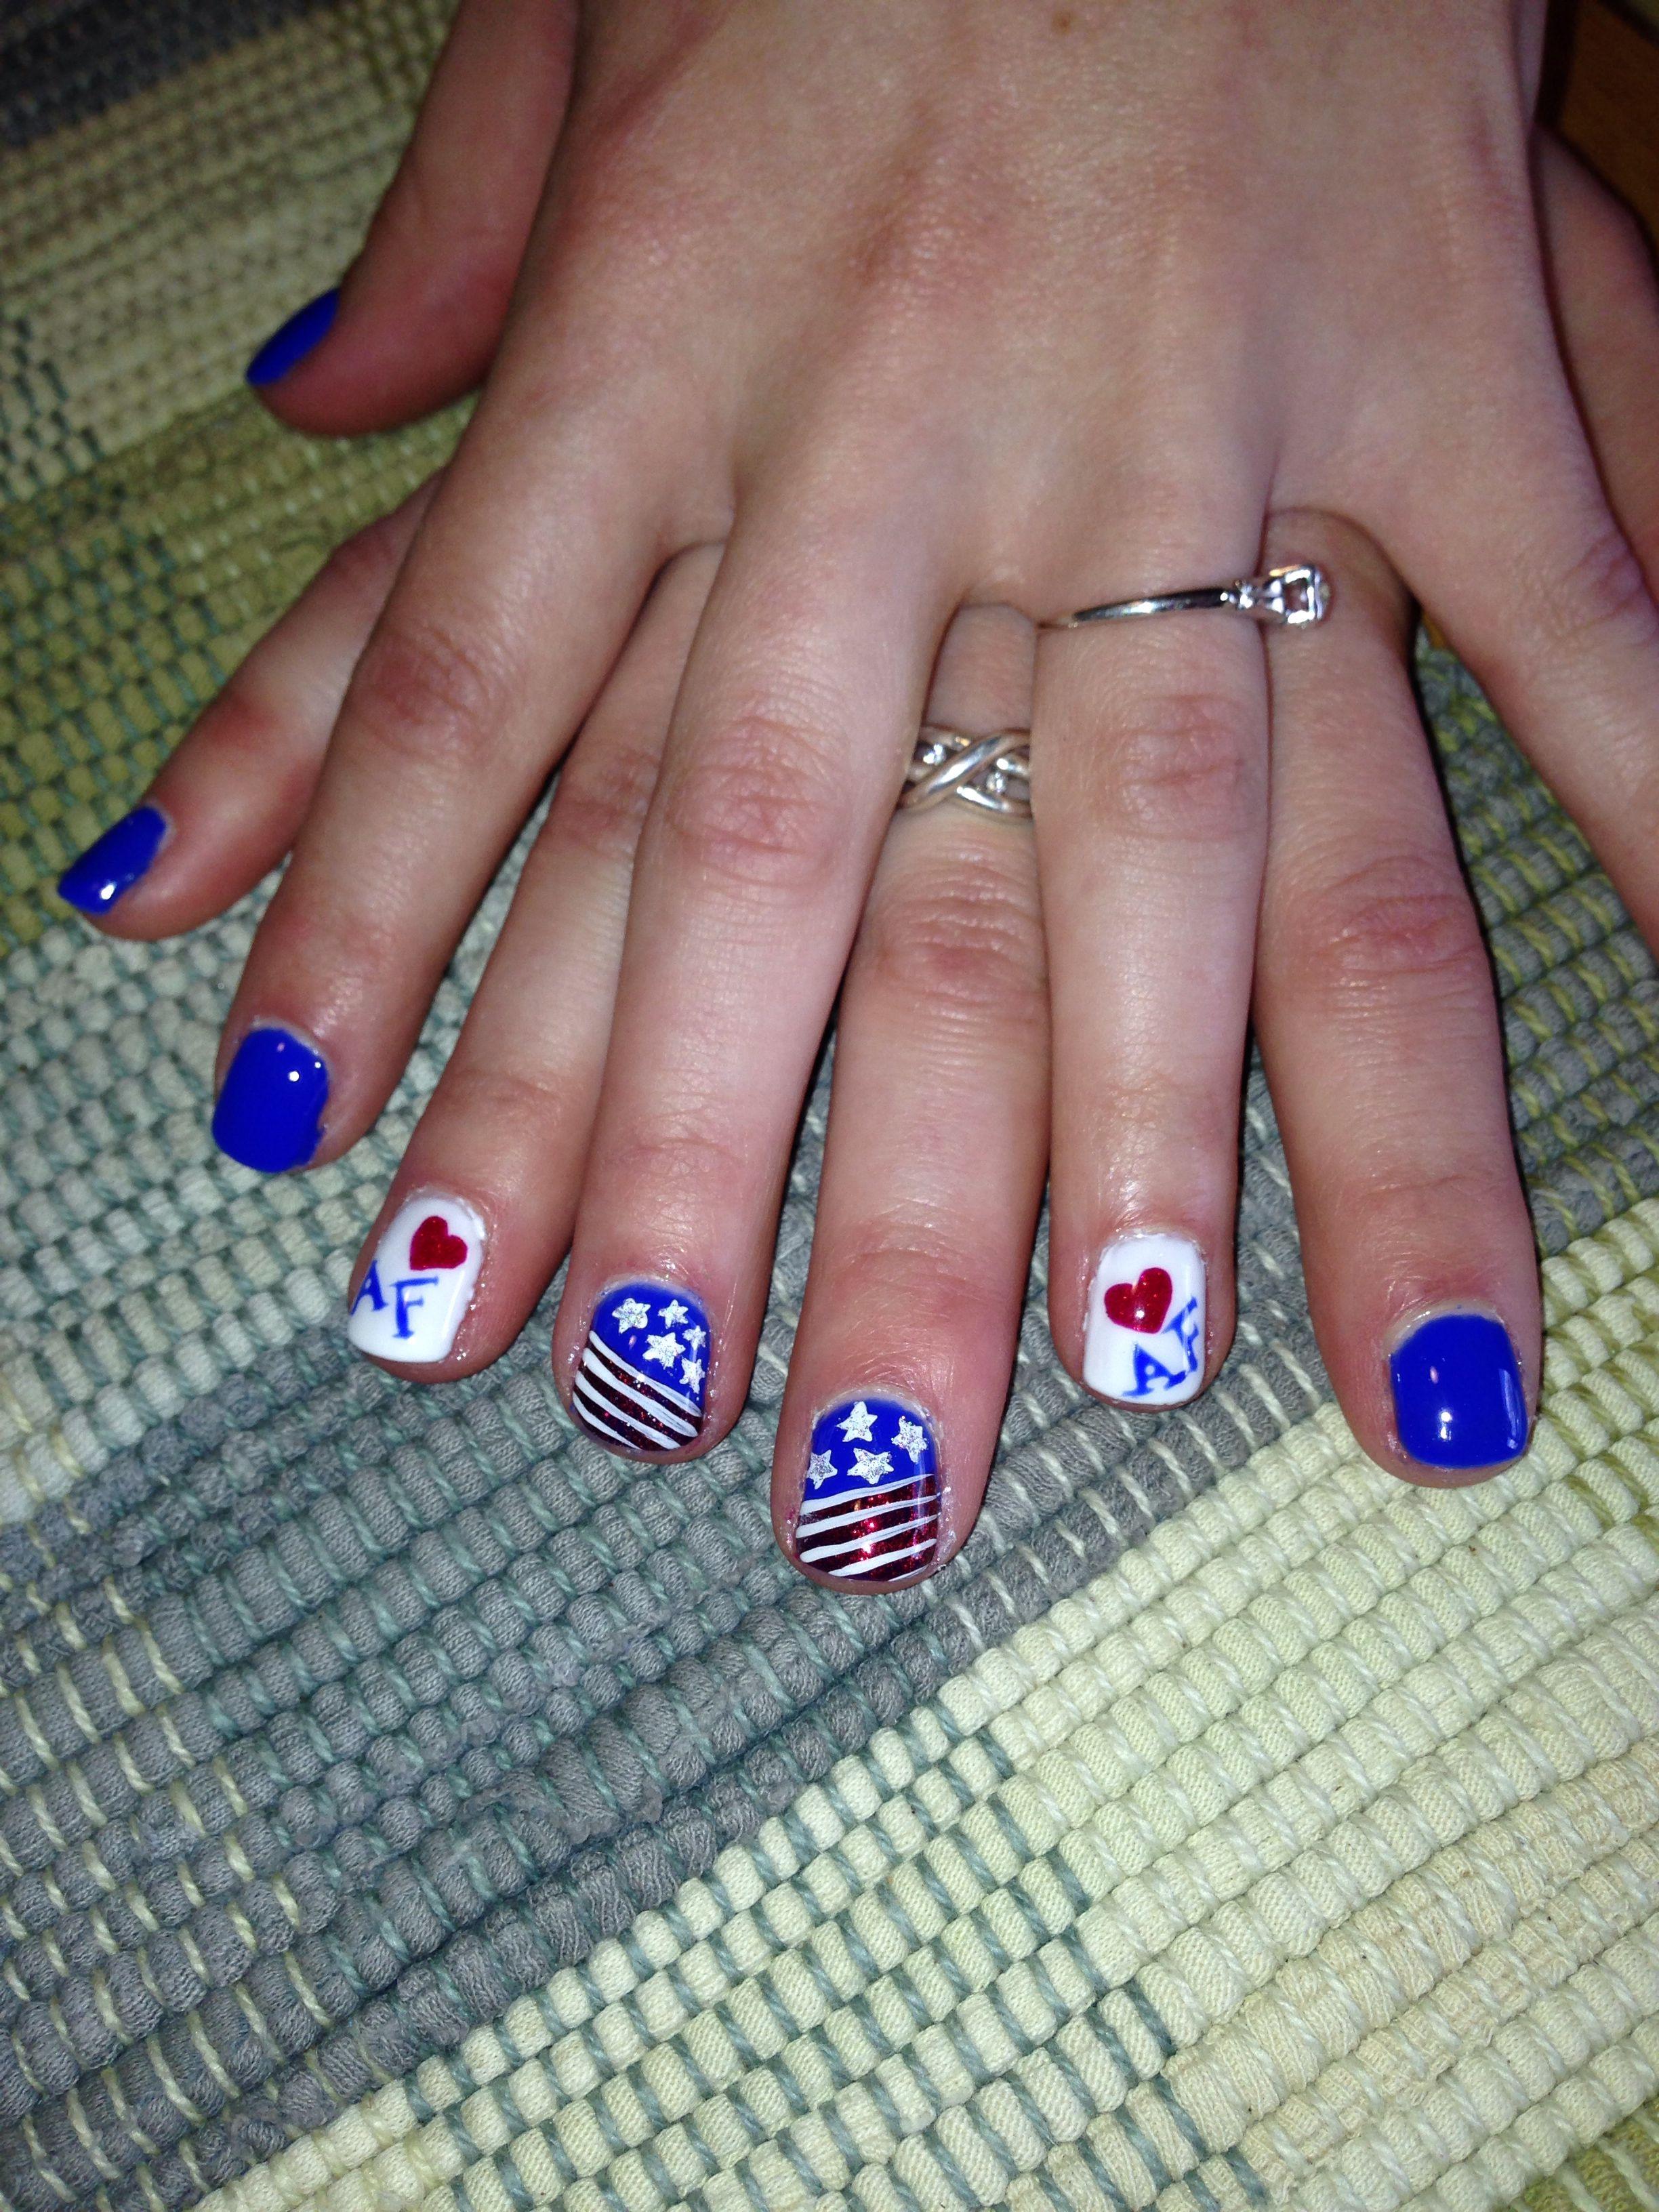 Air Force nail art, flag nails, blue nails (With images